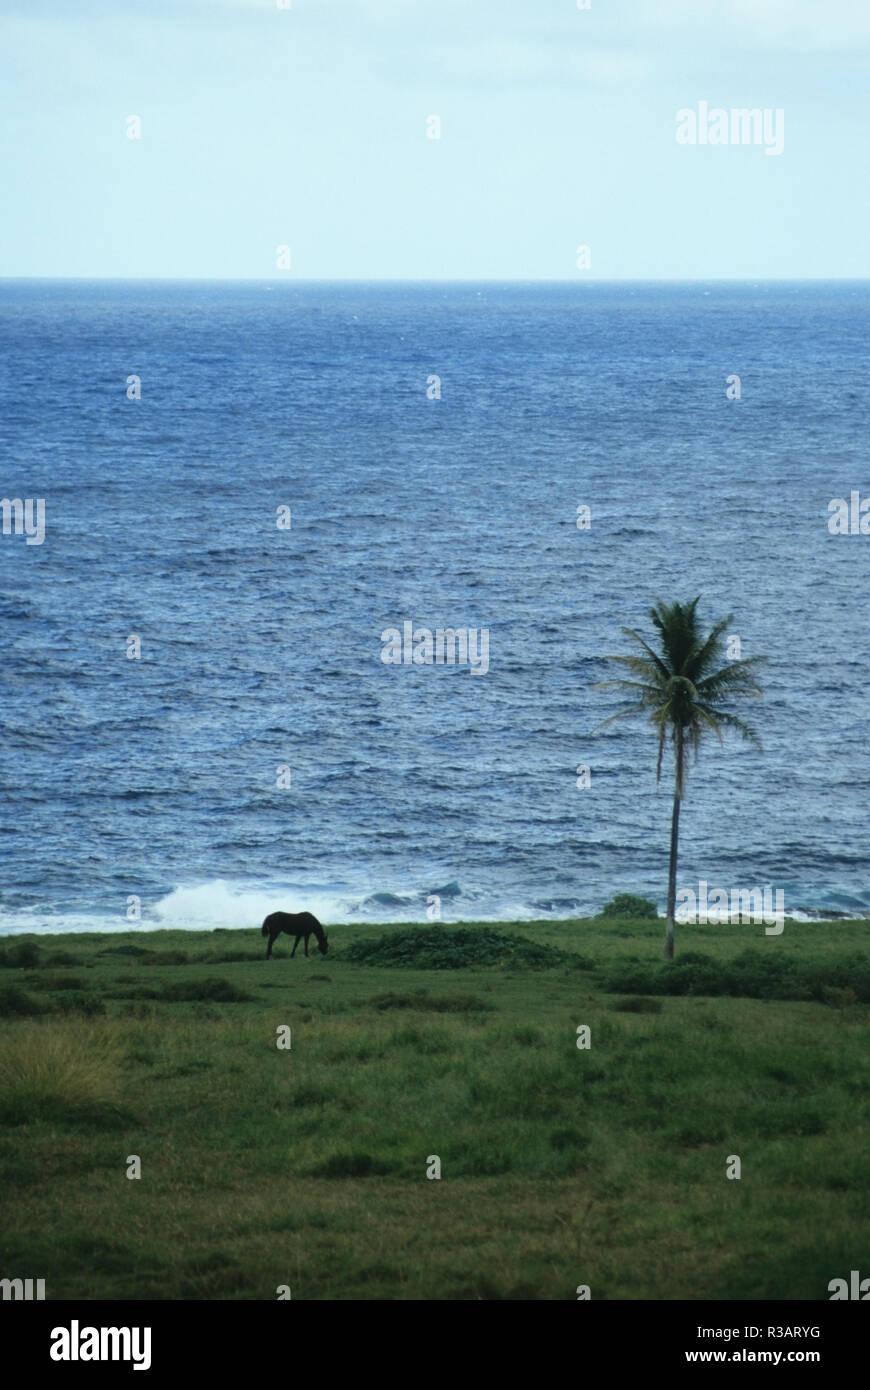 Dating maui hawaii